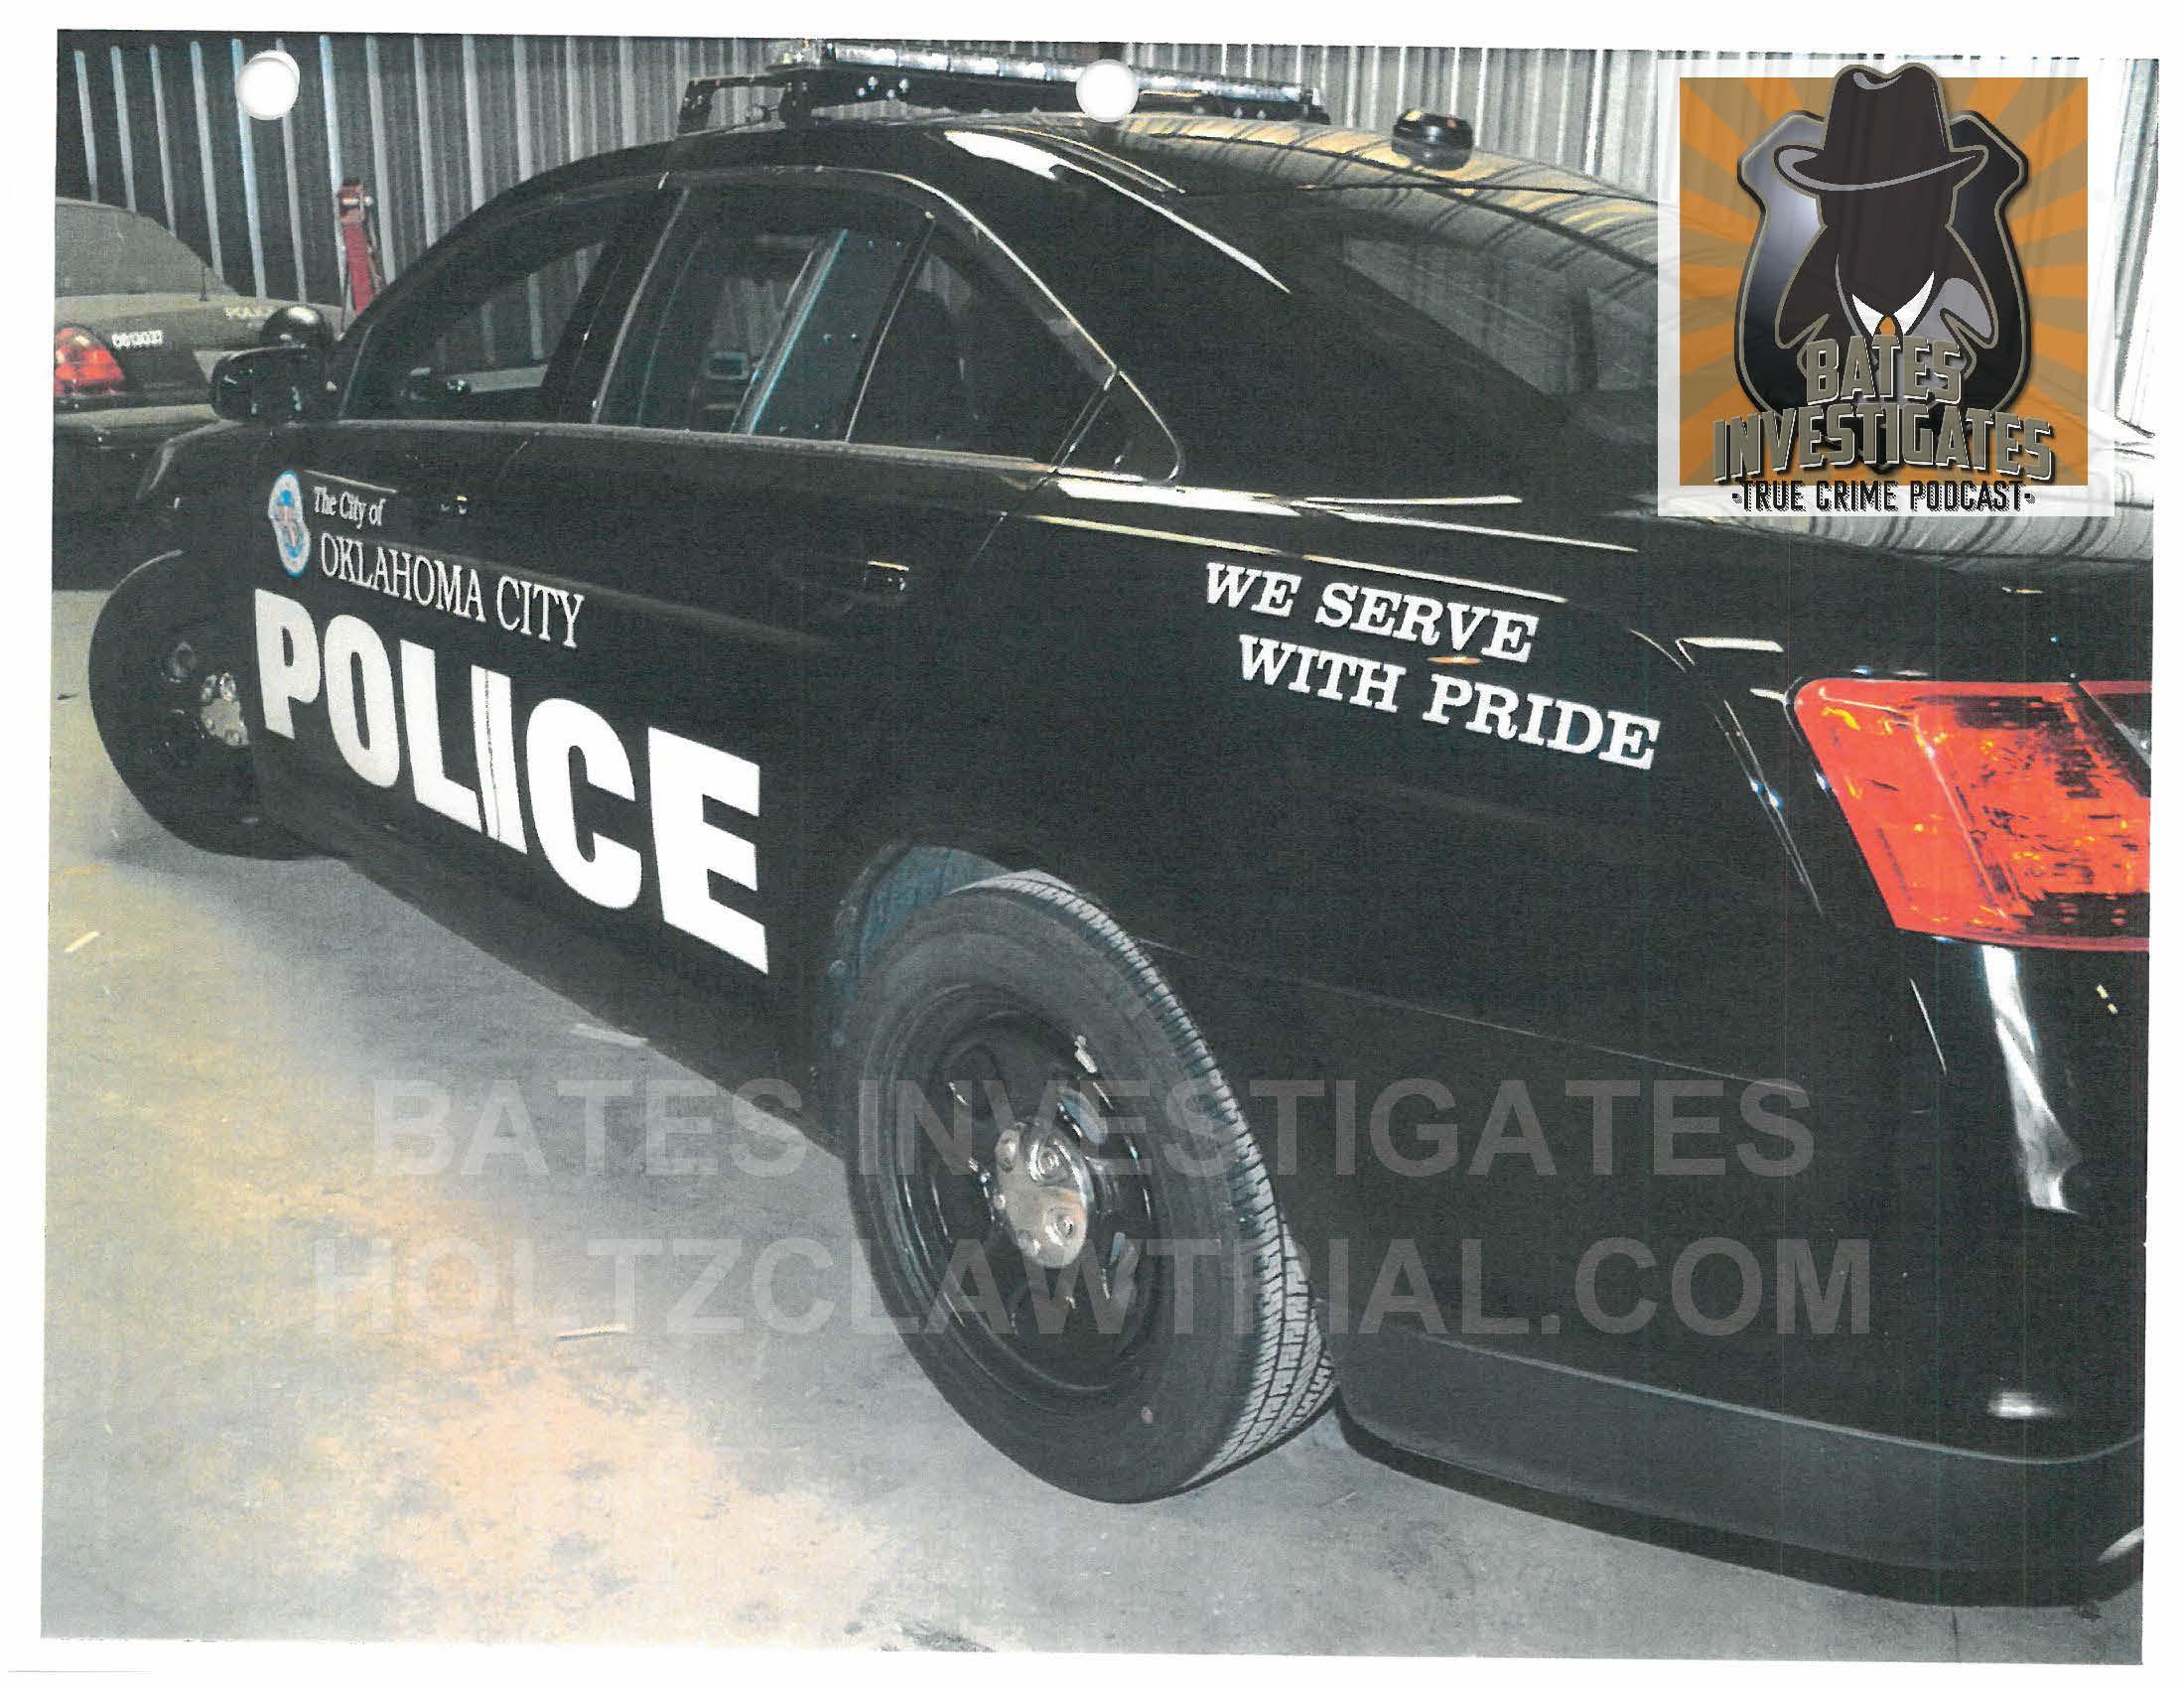 Holtzclaw Daniel - OCPD Patrol Car Photos Watermarked_Page_08.jpg